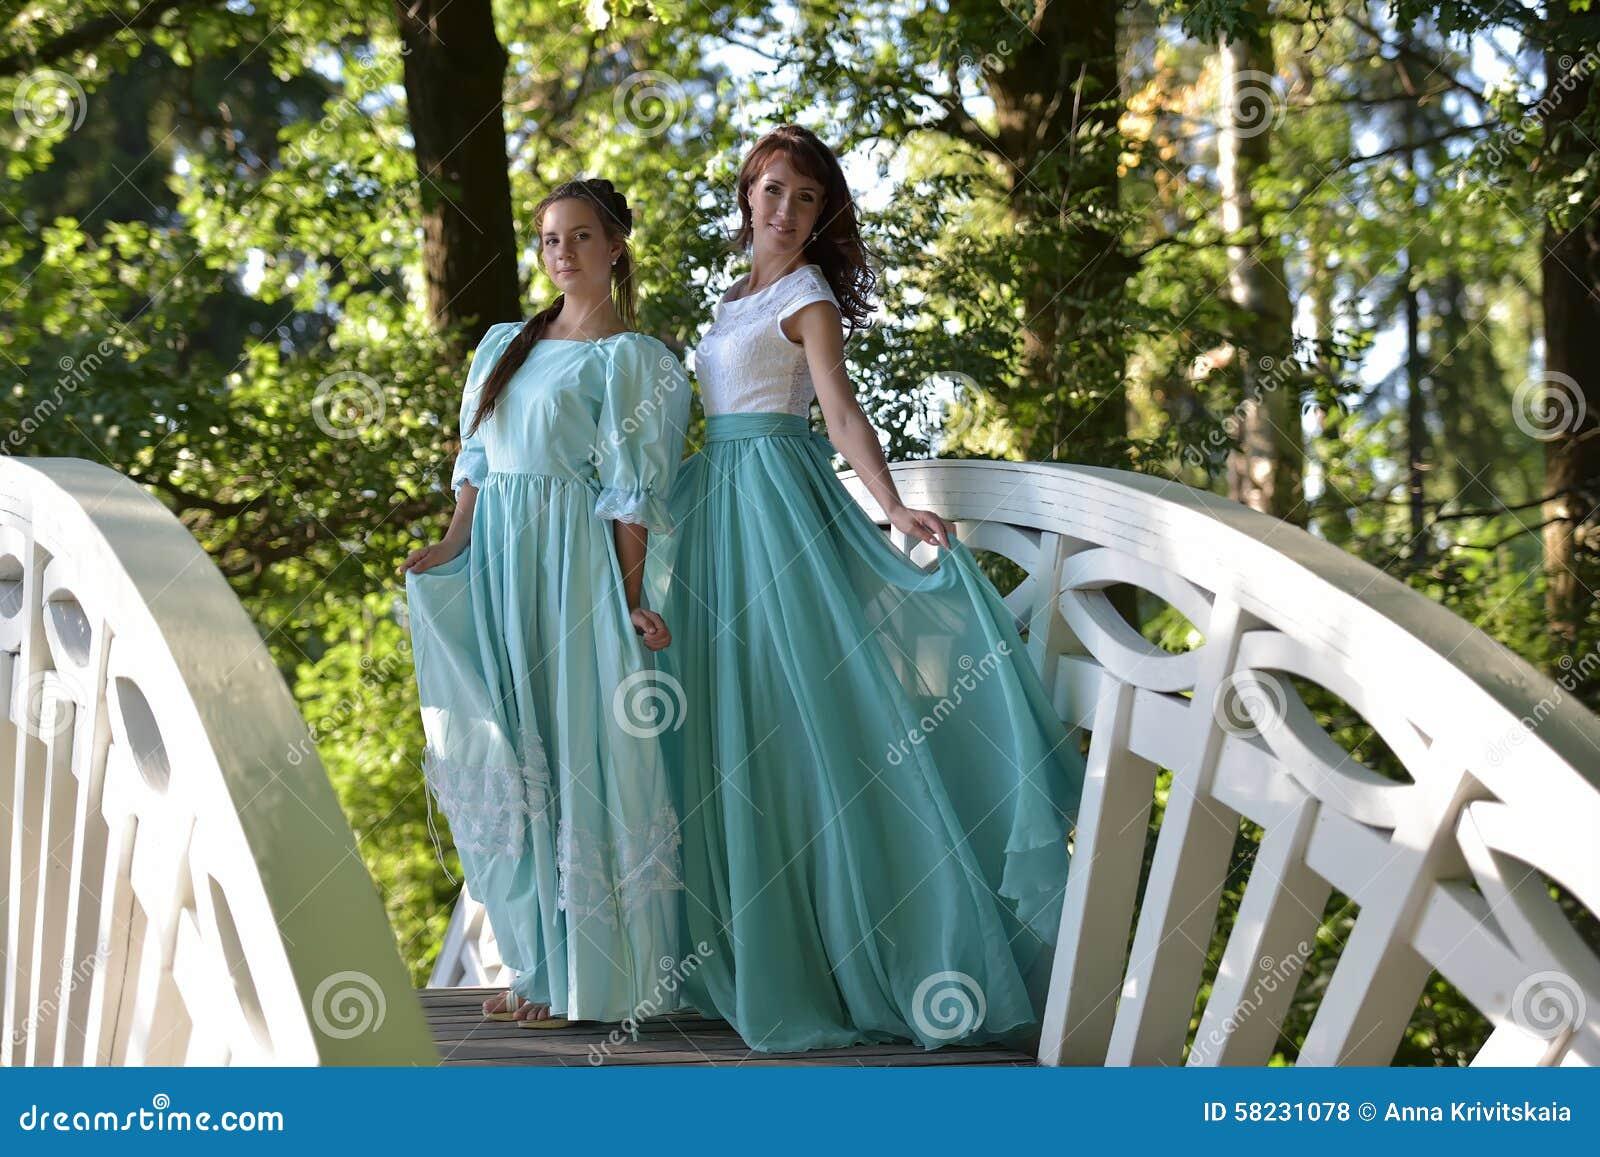 46b65c0d26a φορέματα που εξισώνουν δύ& στοκ εικόνες. εικόνα από δύο - 58231078